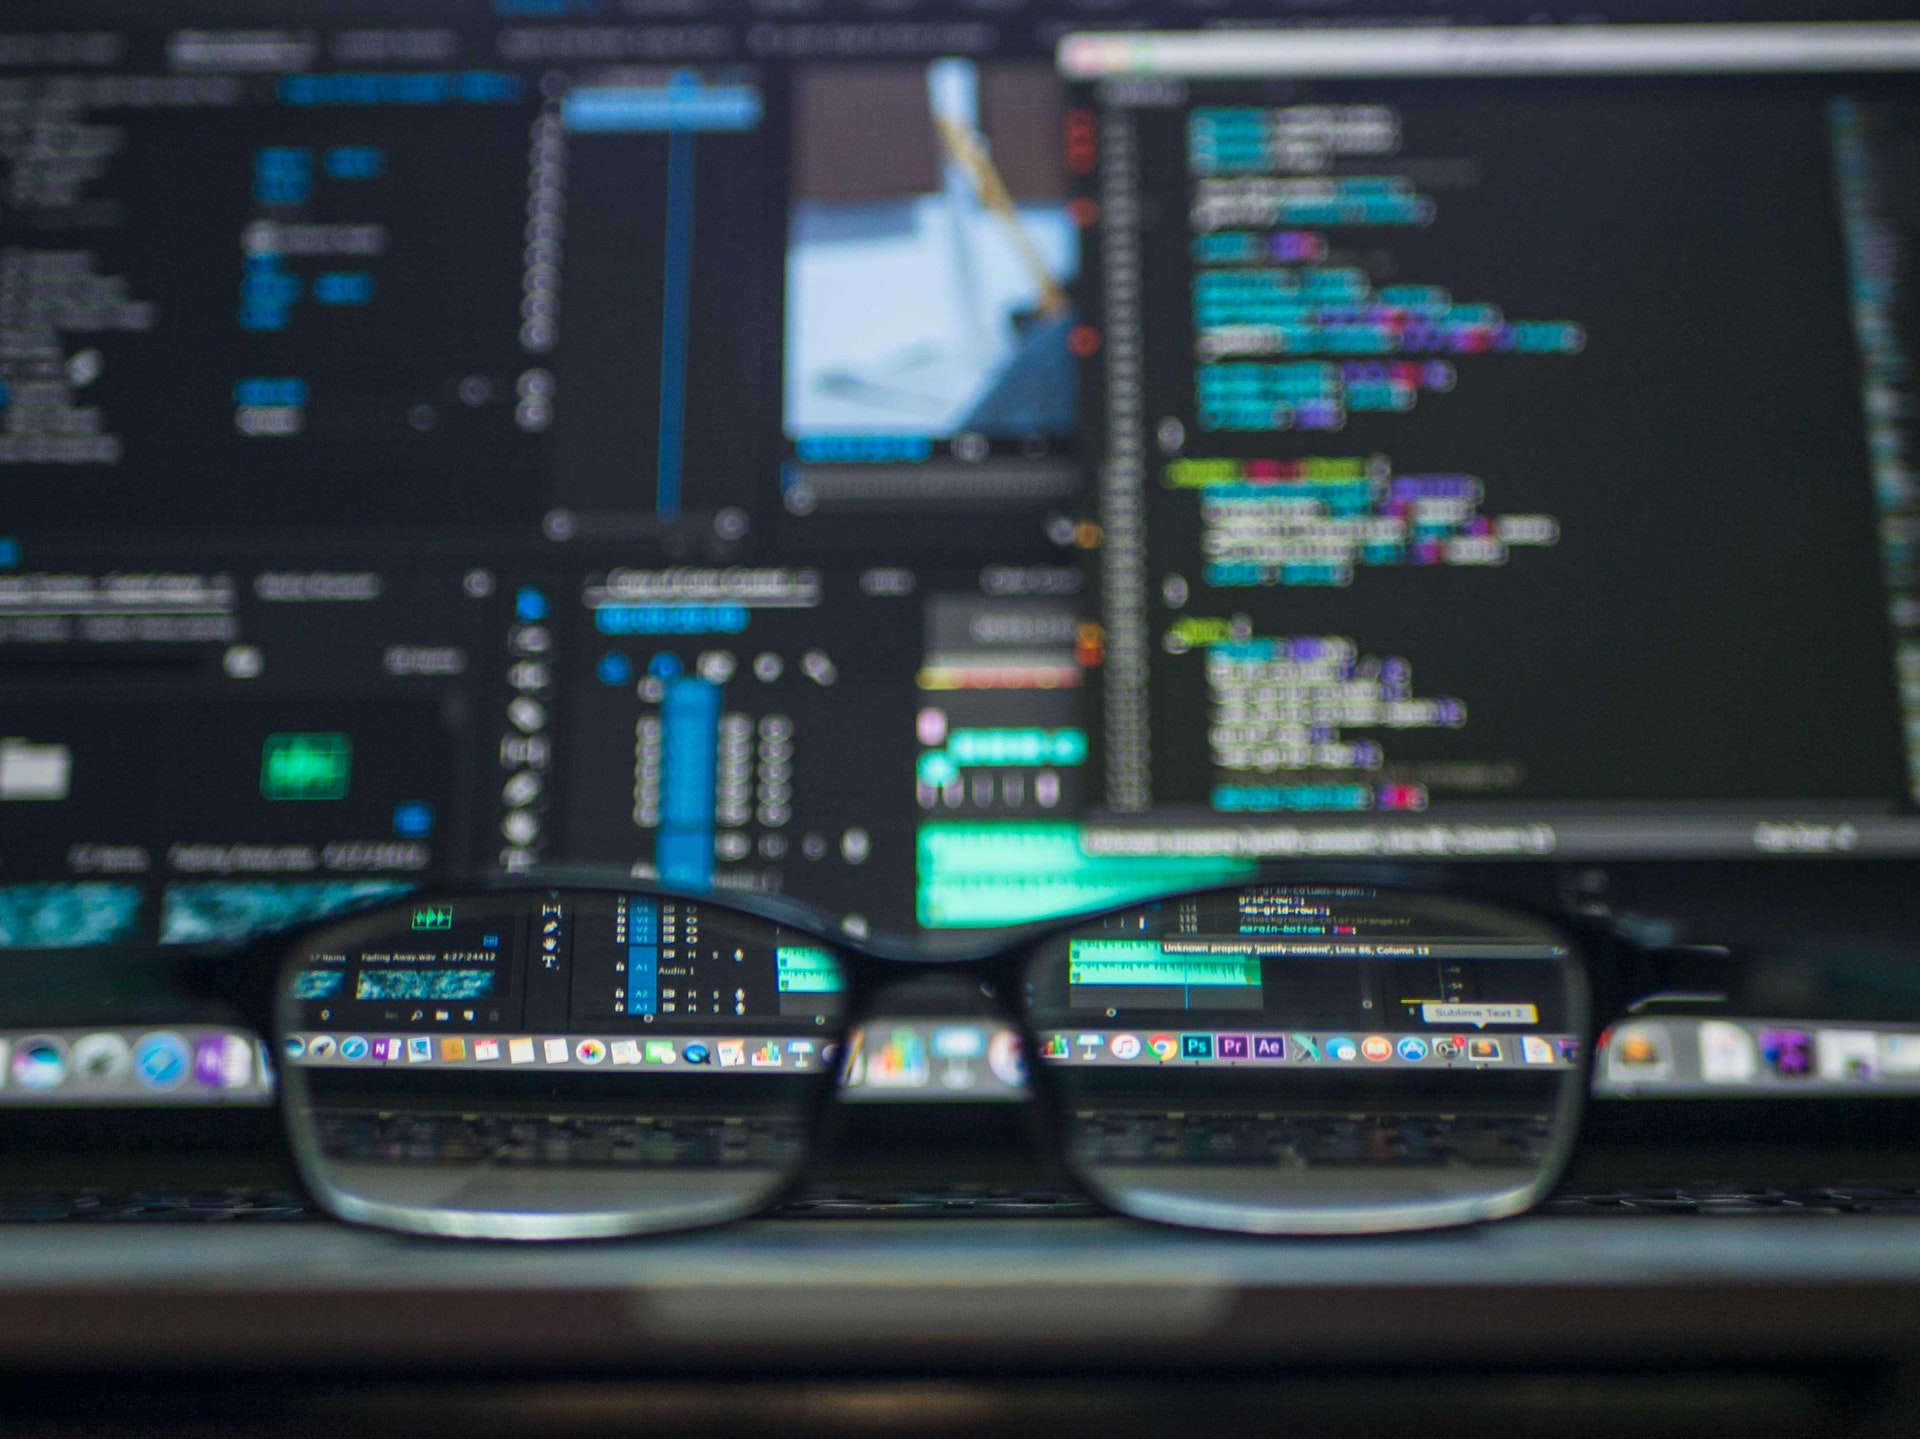 Lezioni Di Informatica Online